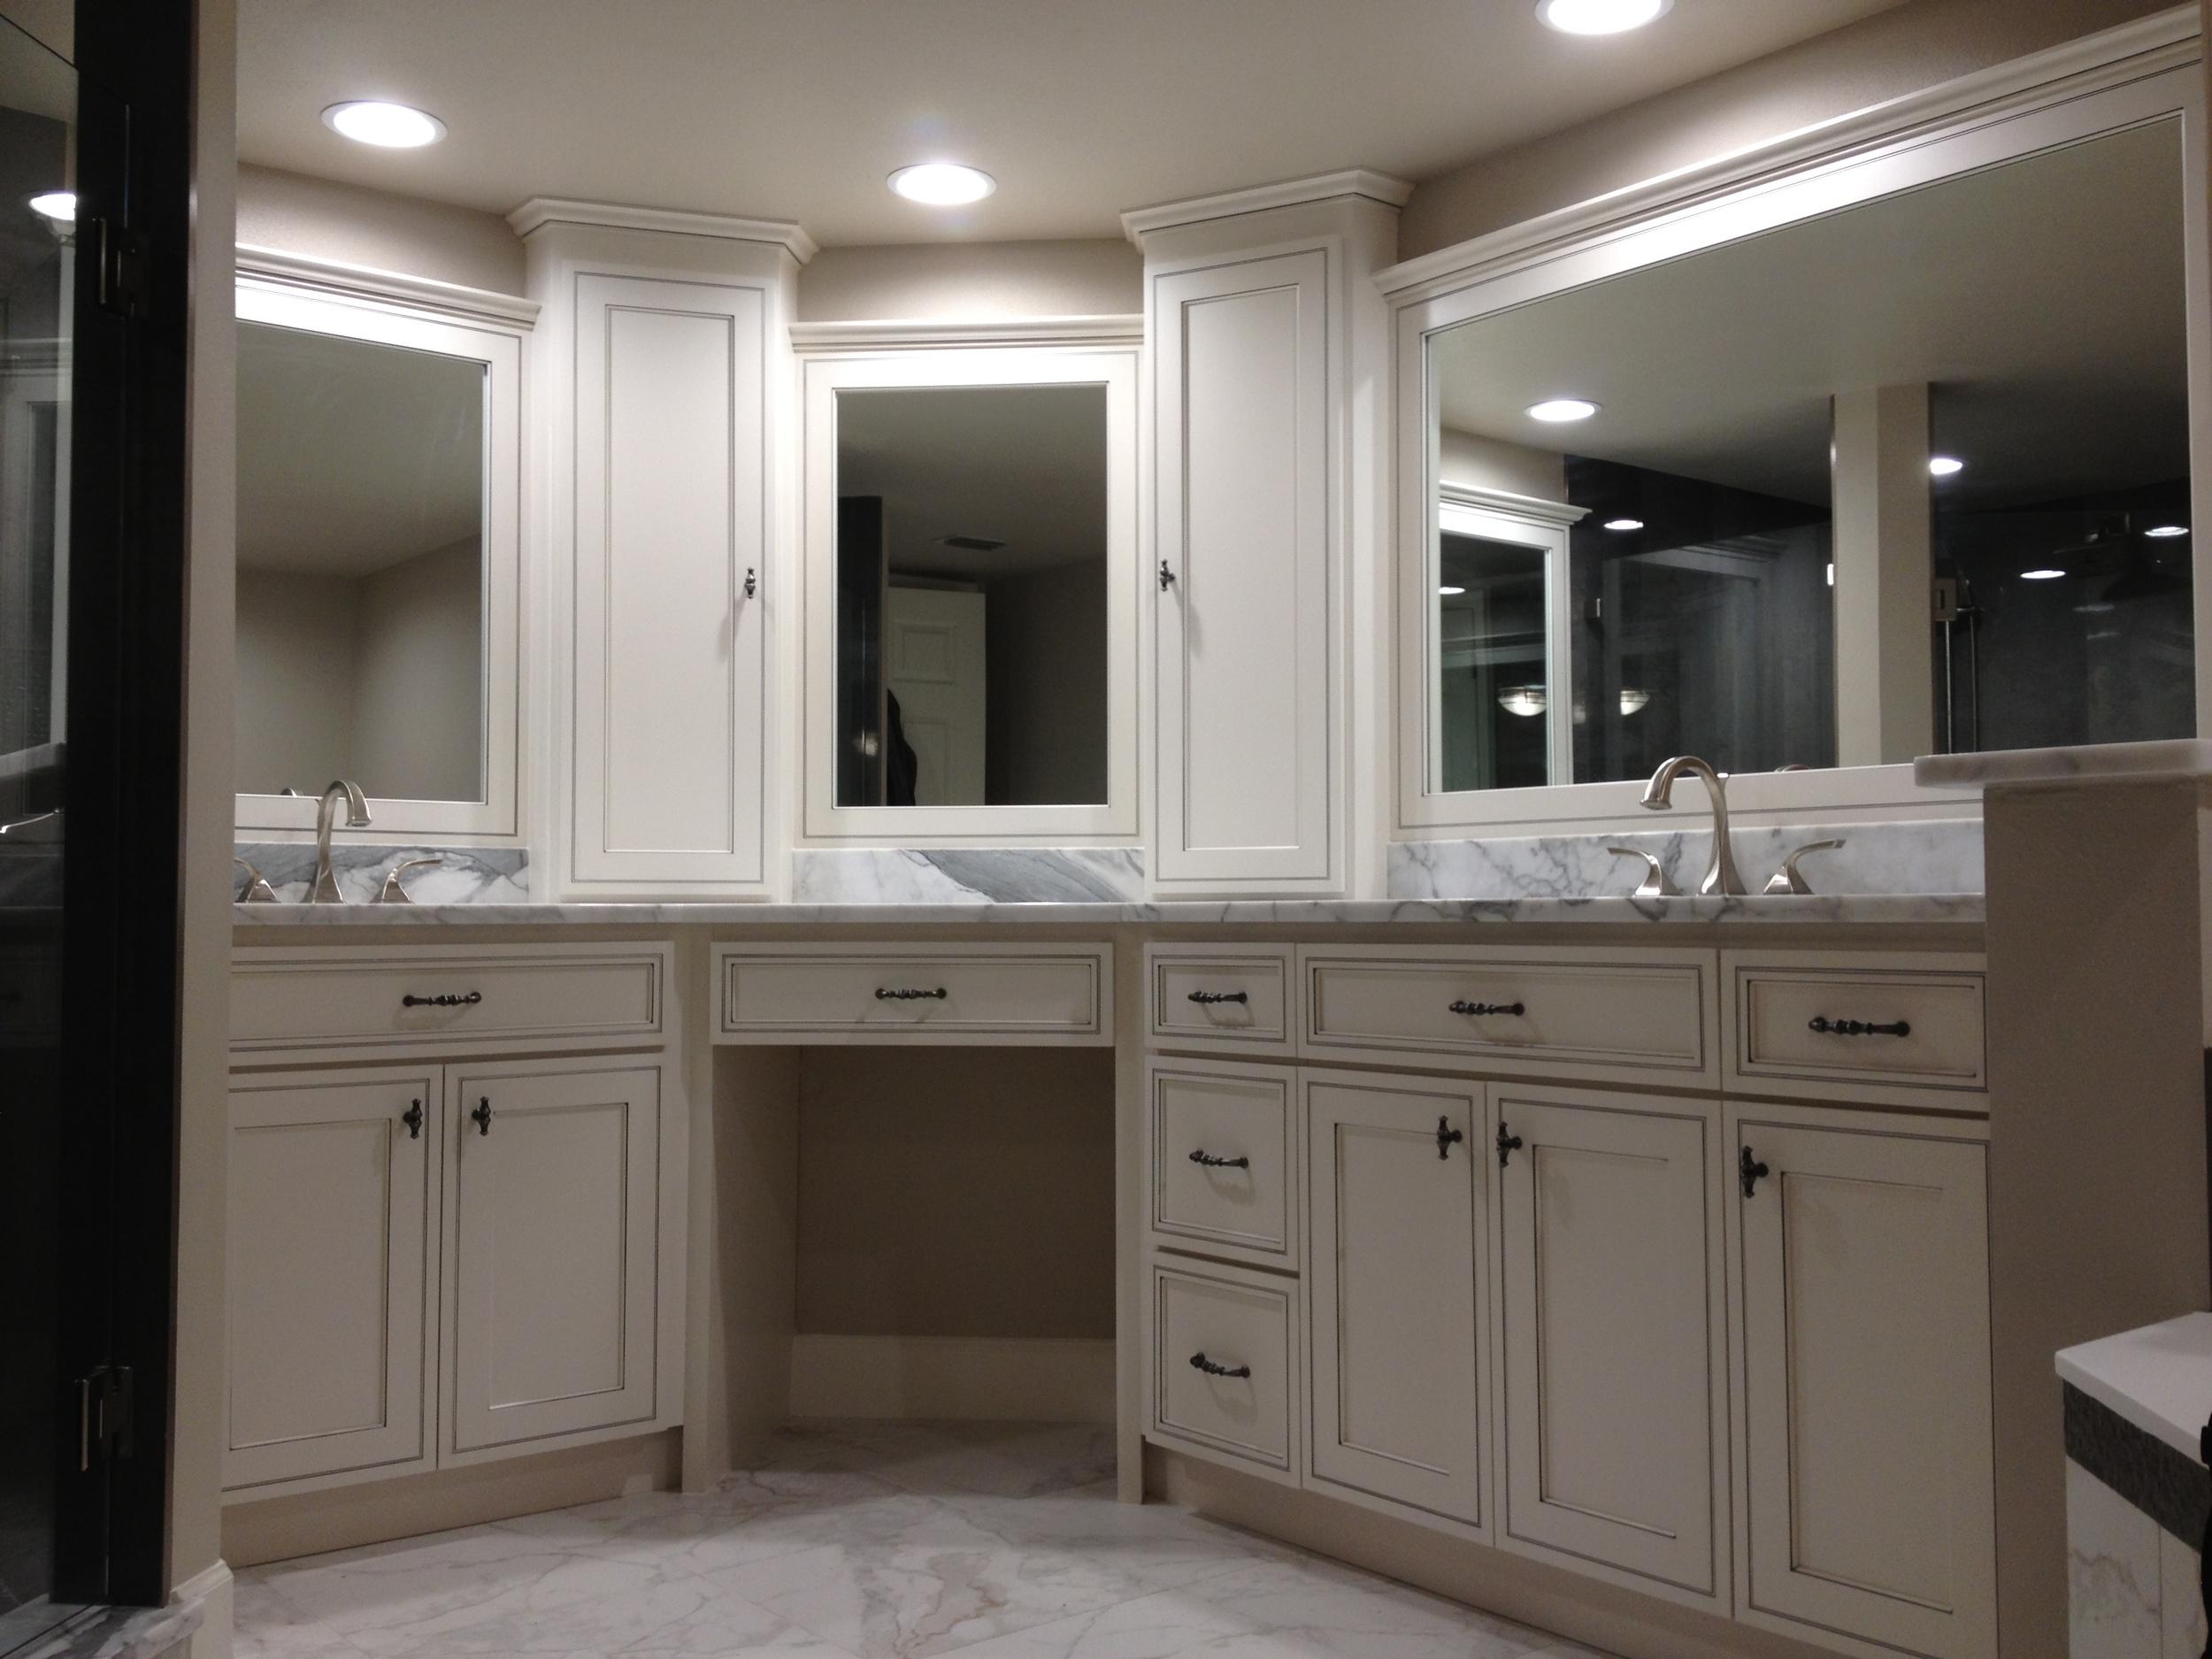 Master Bathroom10.JPG